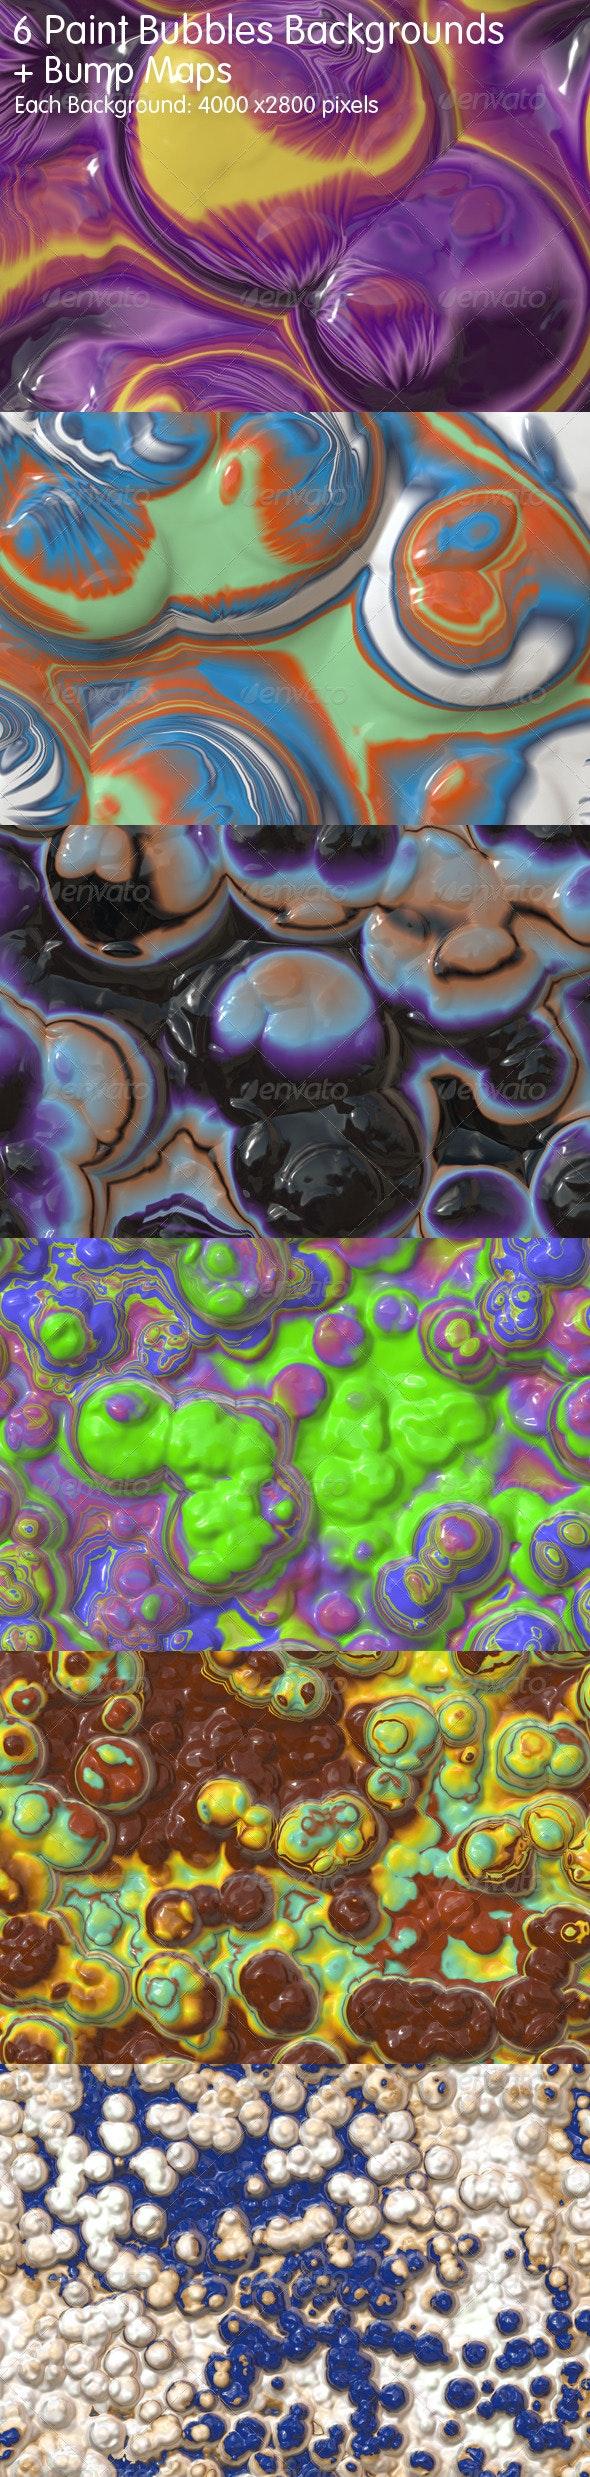 6 Paint Bubbles Backgrounds - Set #1 - Abstract Backgrounds